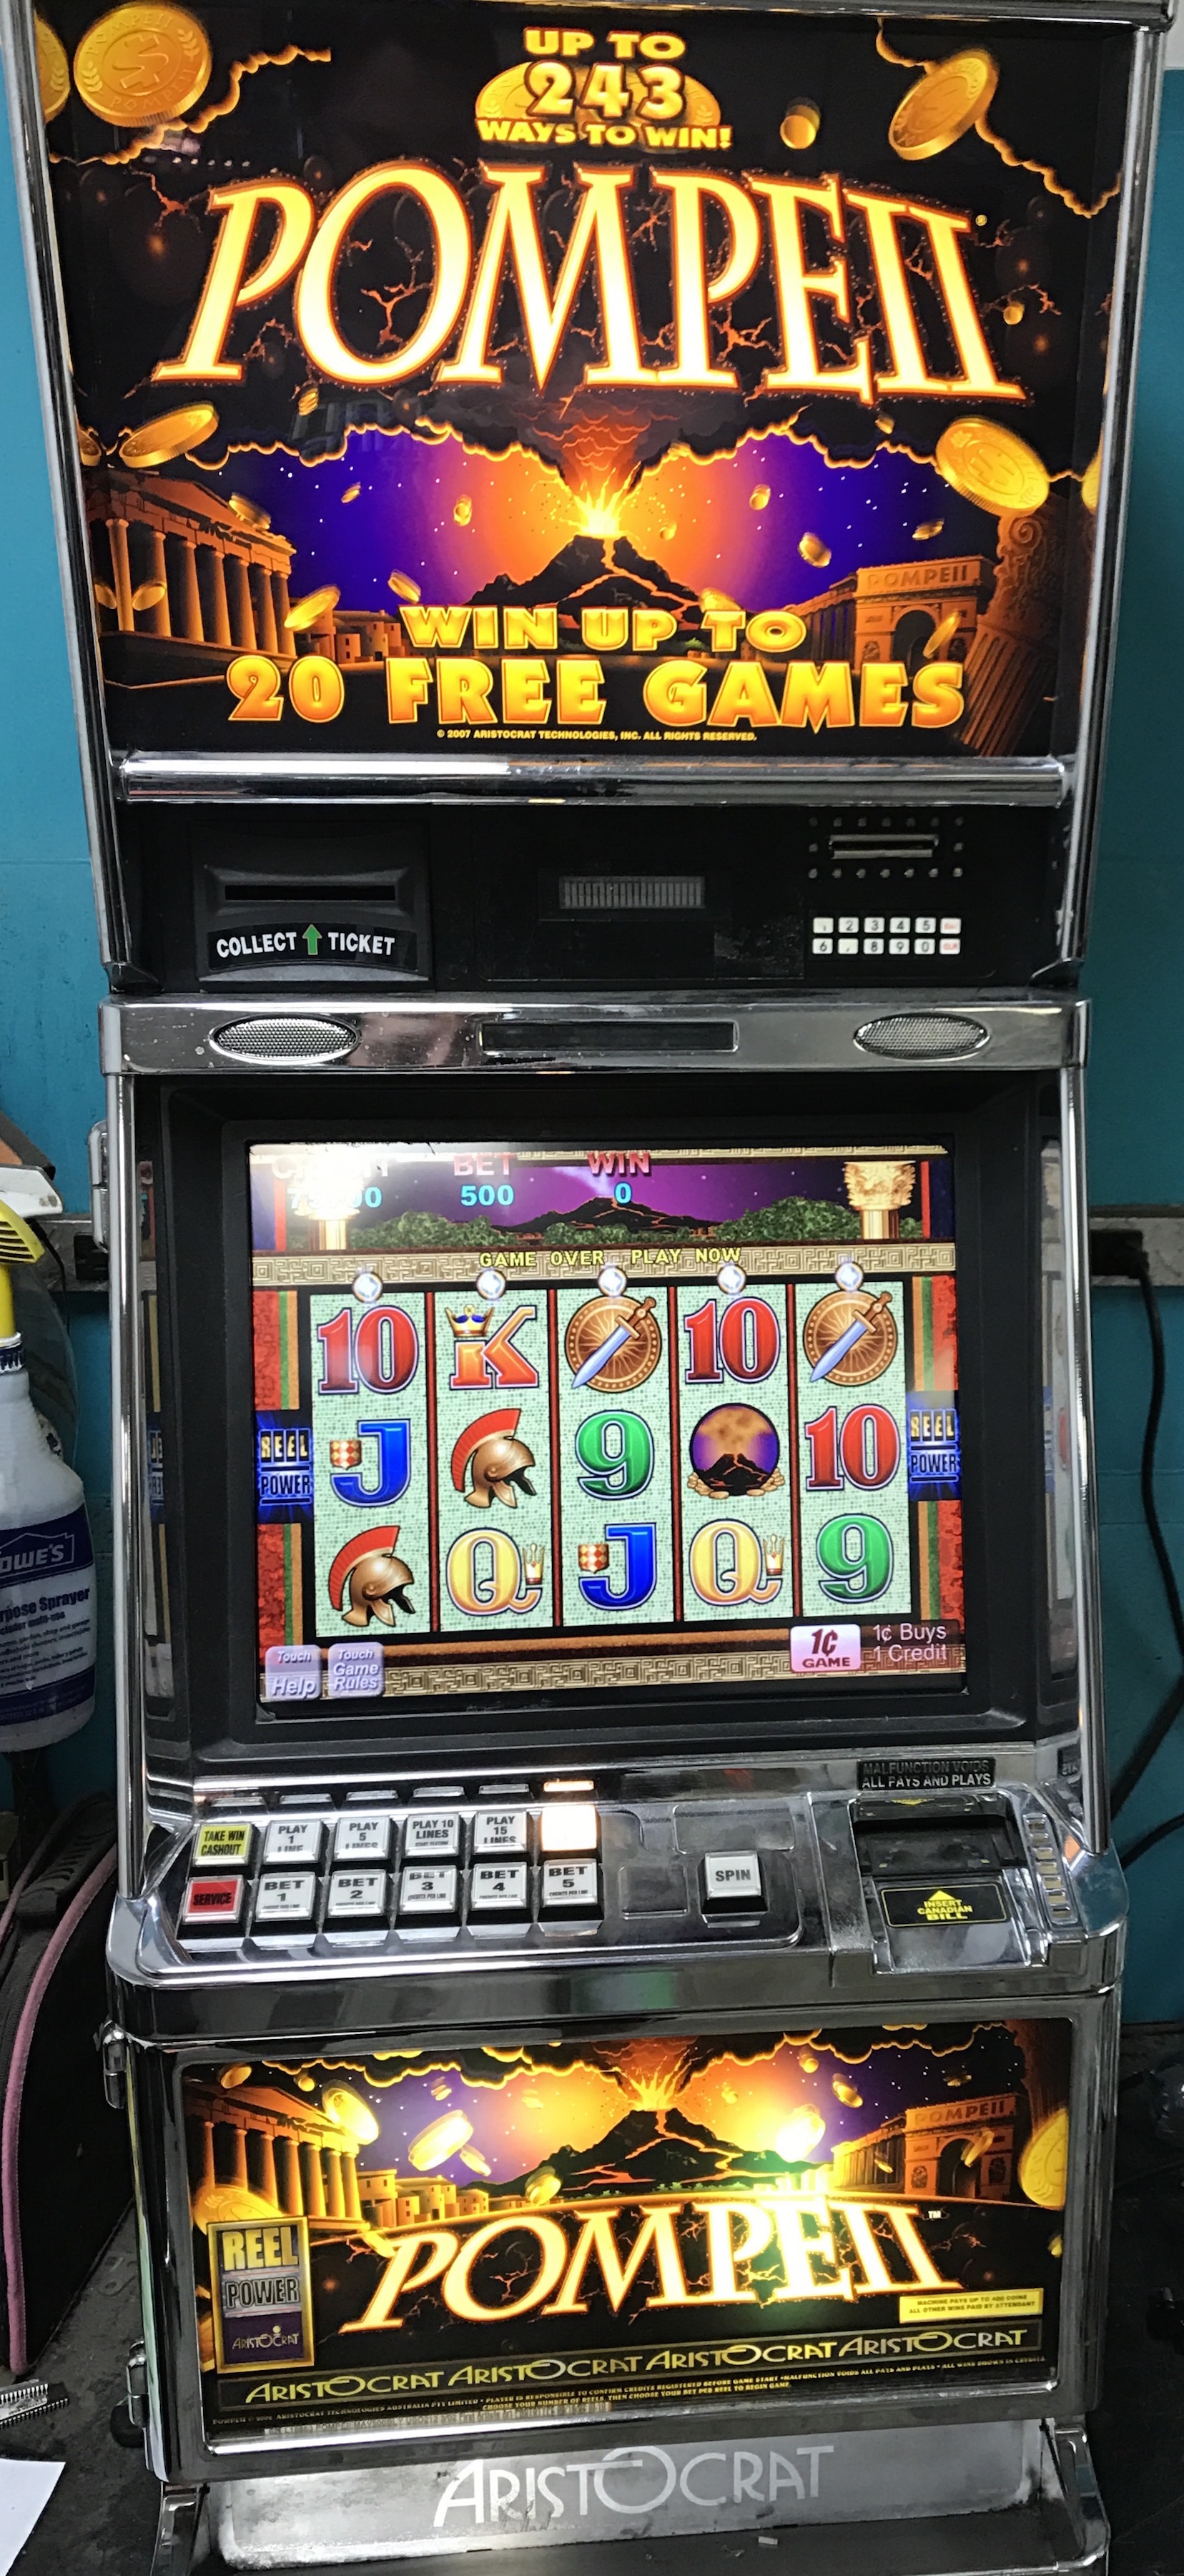 pompeii slot machine for sale